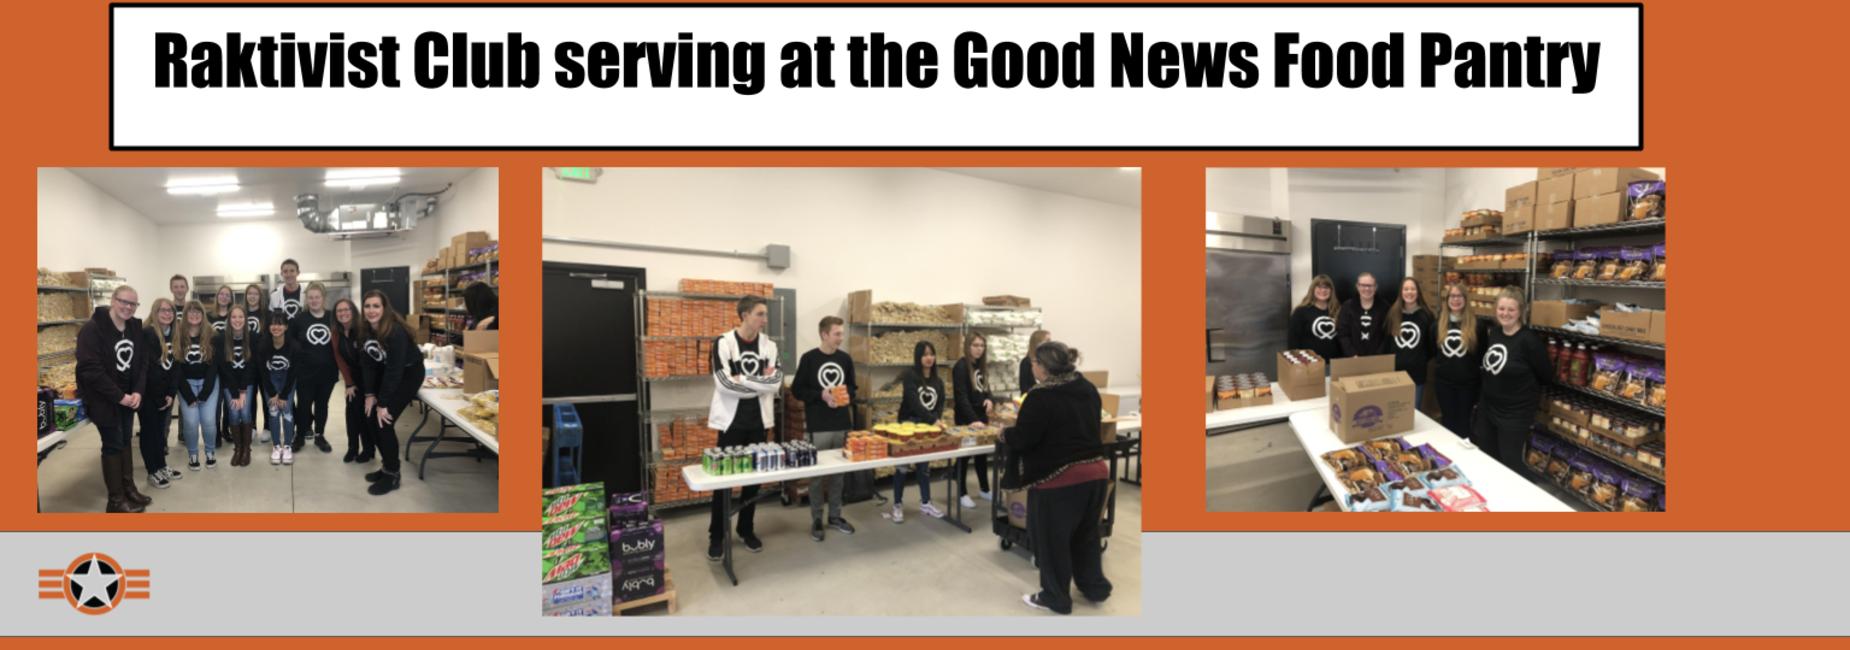 Raktivist Club serving at the Good News Pantry